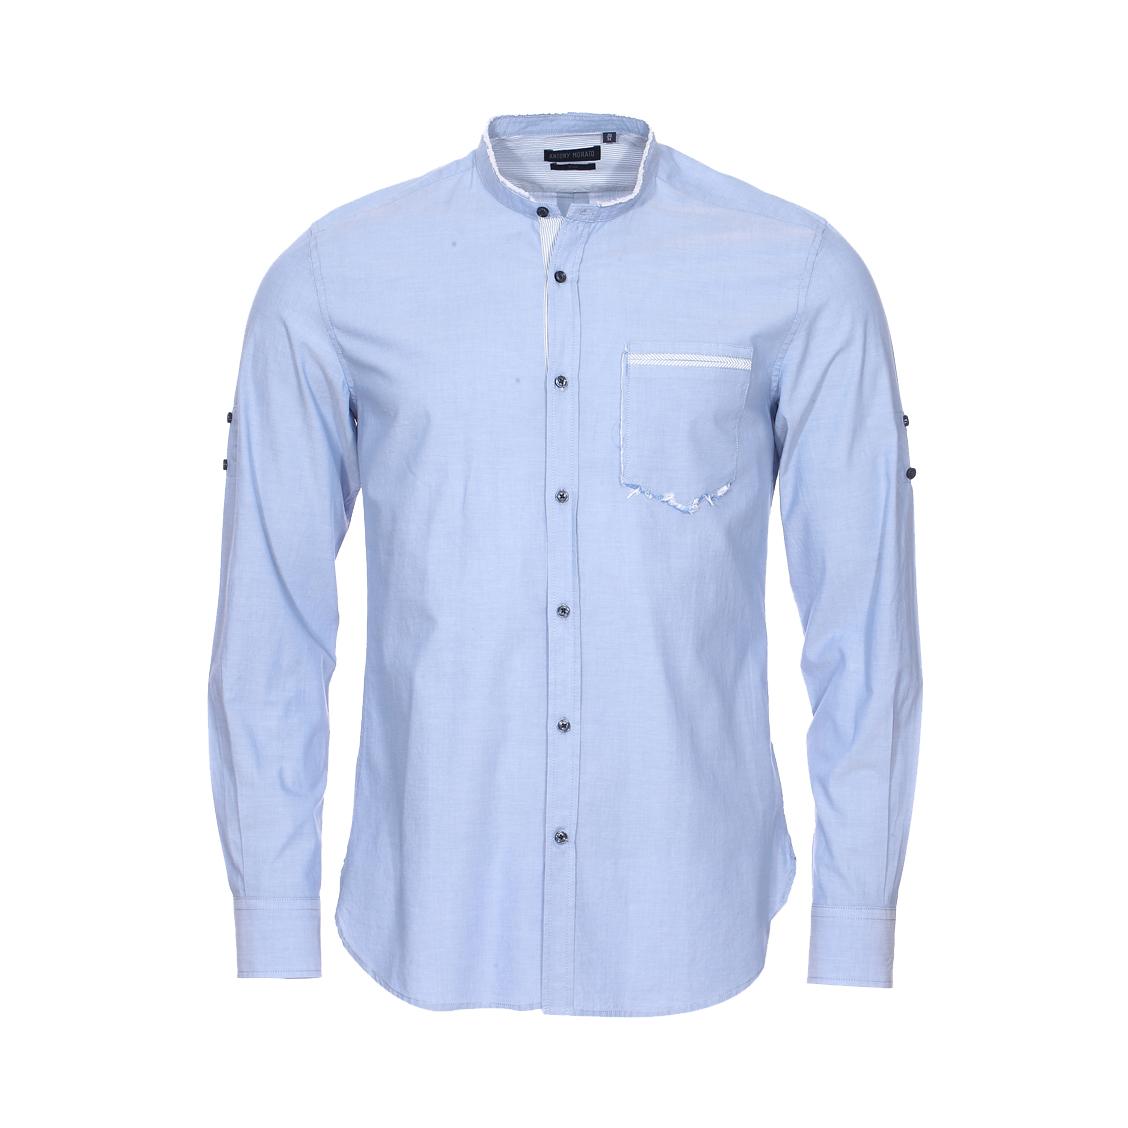 Chemise cintrée Antony Morato en coton bleu indigo à col mao